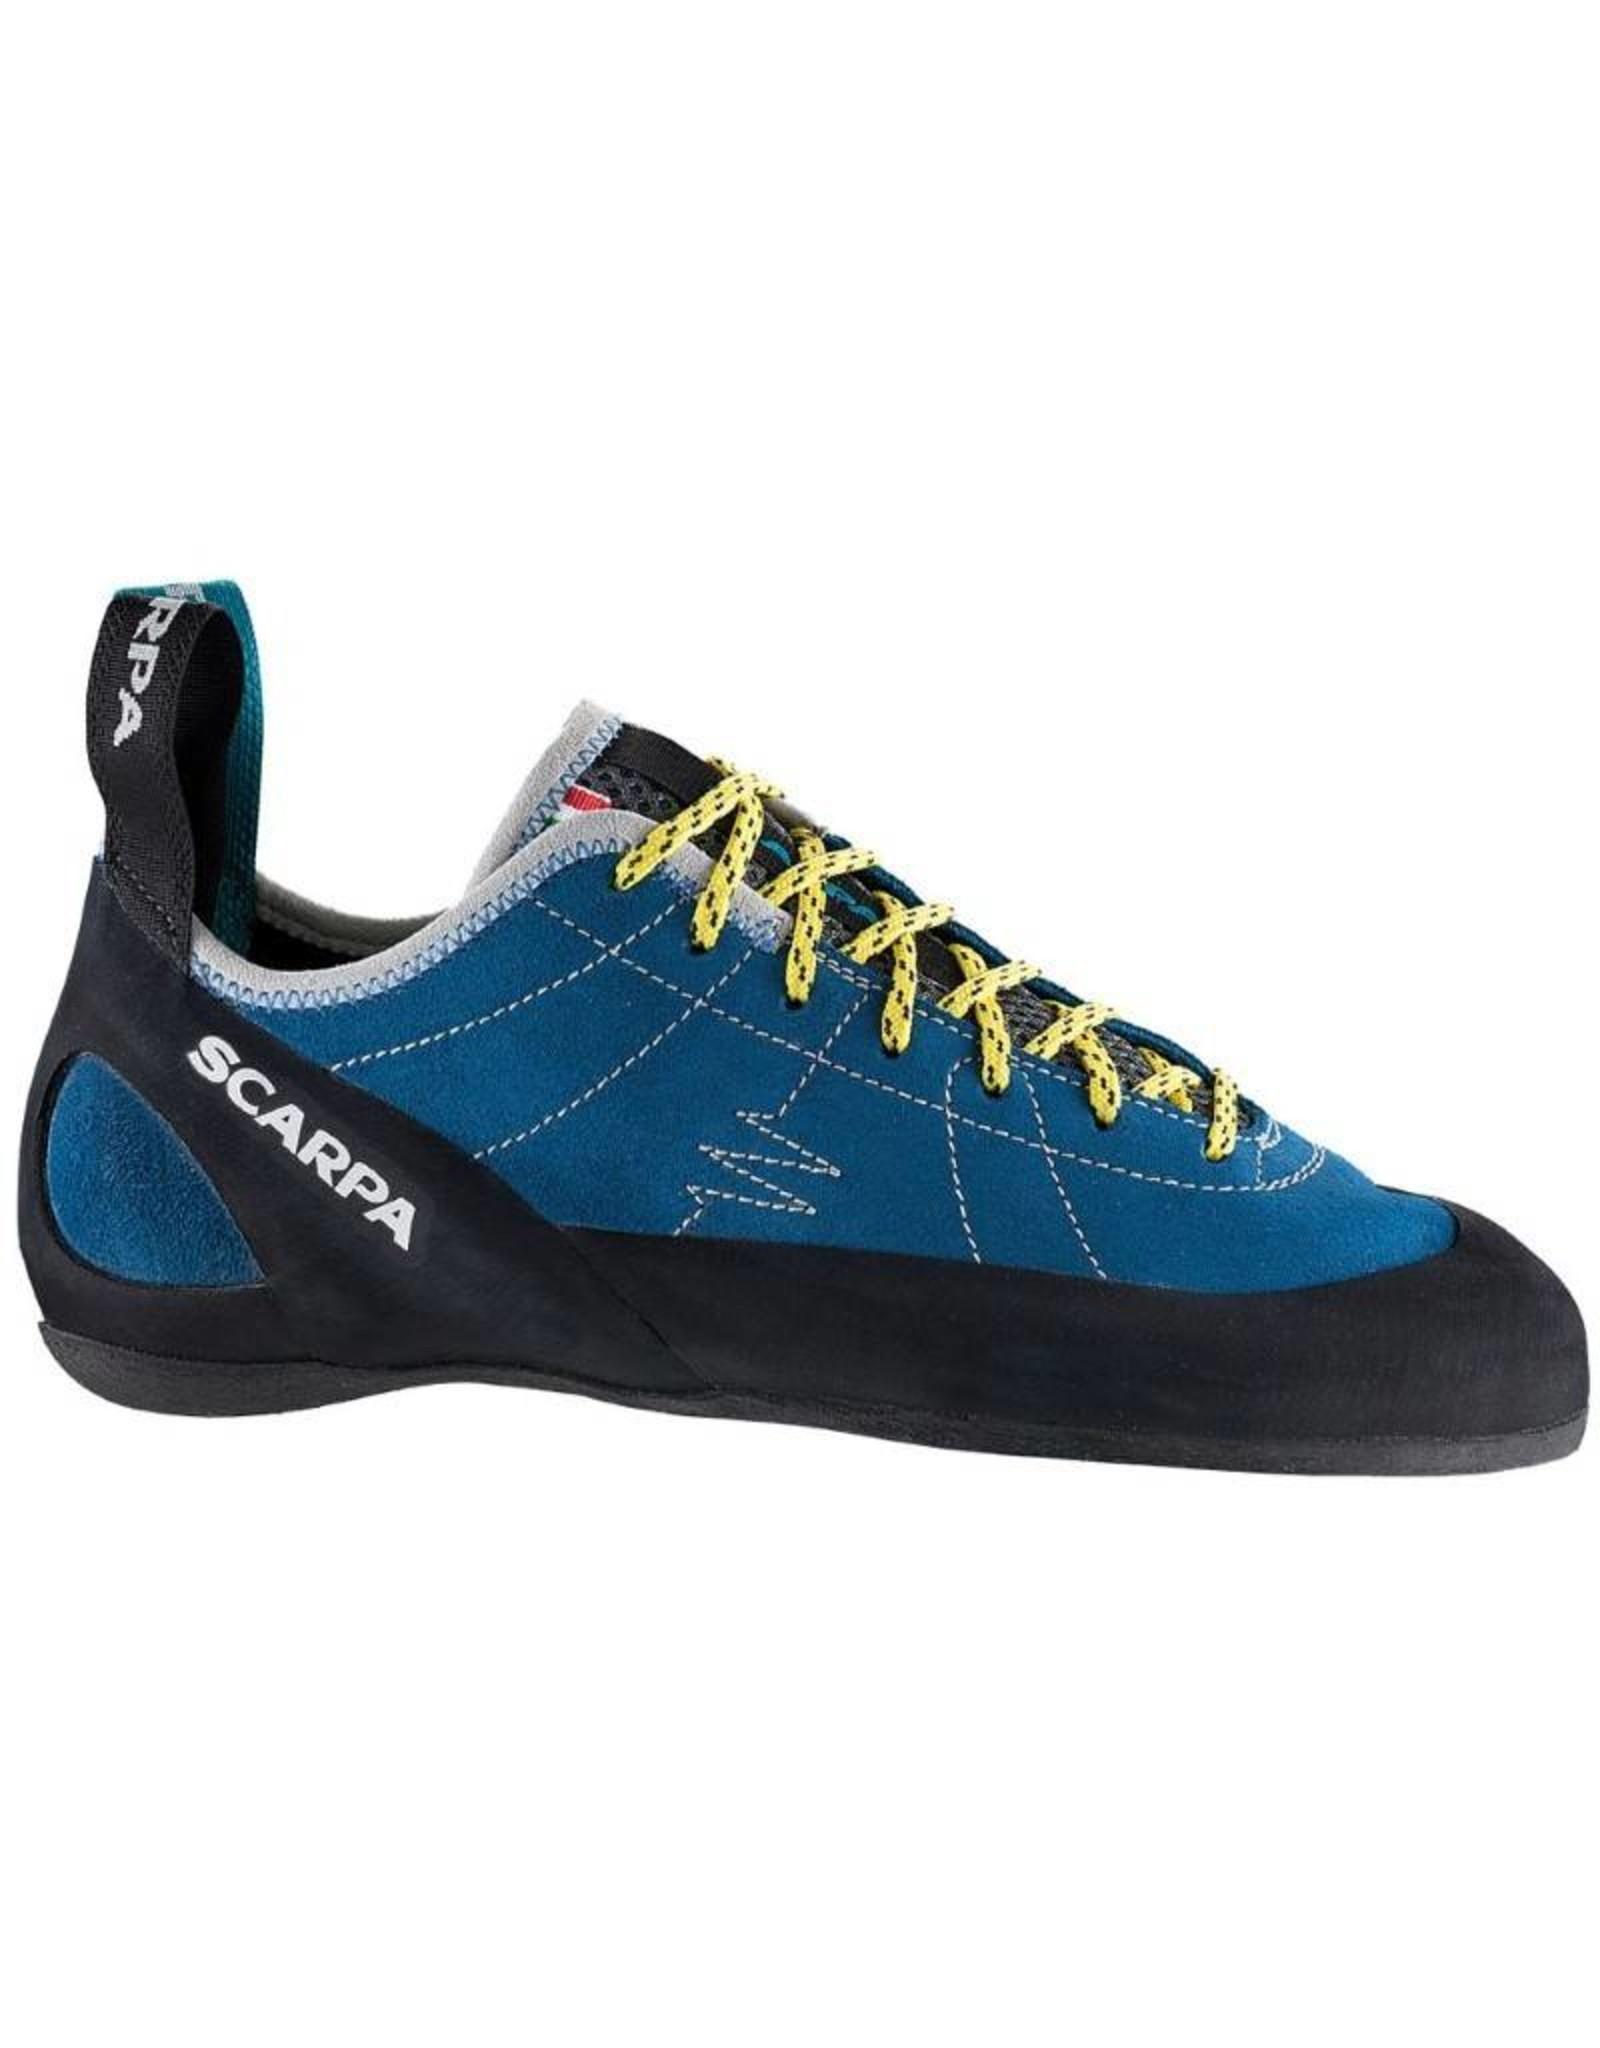 Scarpa Scarpa Helix Climbing Shoes